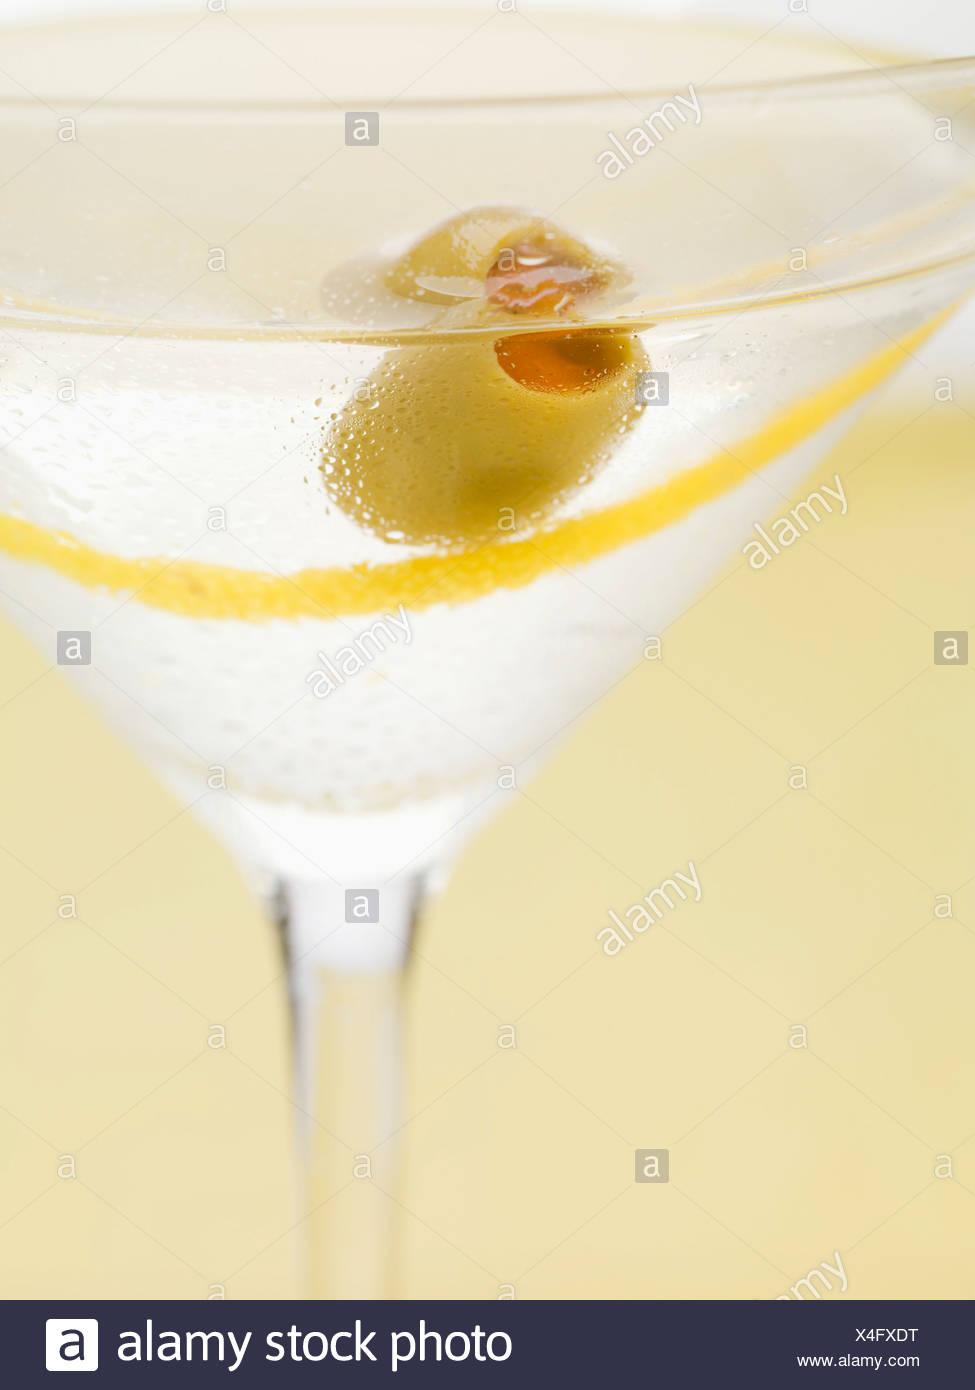 b5decda90a2c Martini with olive and lemon zest (close-up Stock Photo  278174564 ...